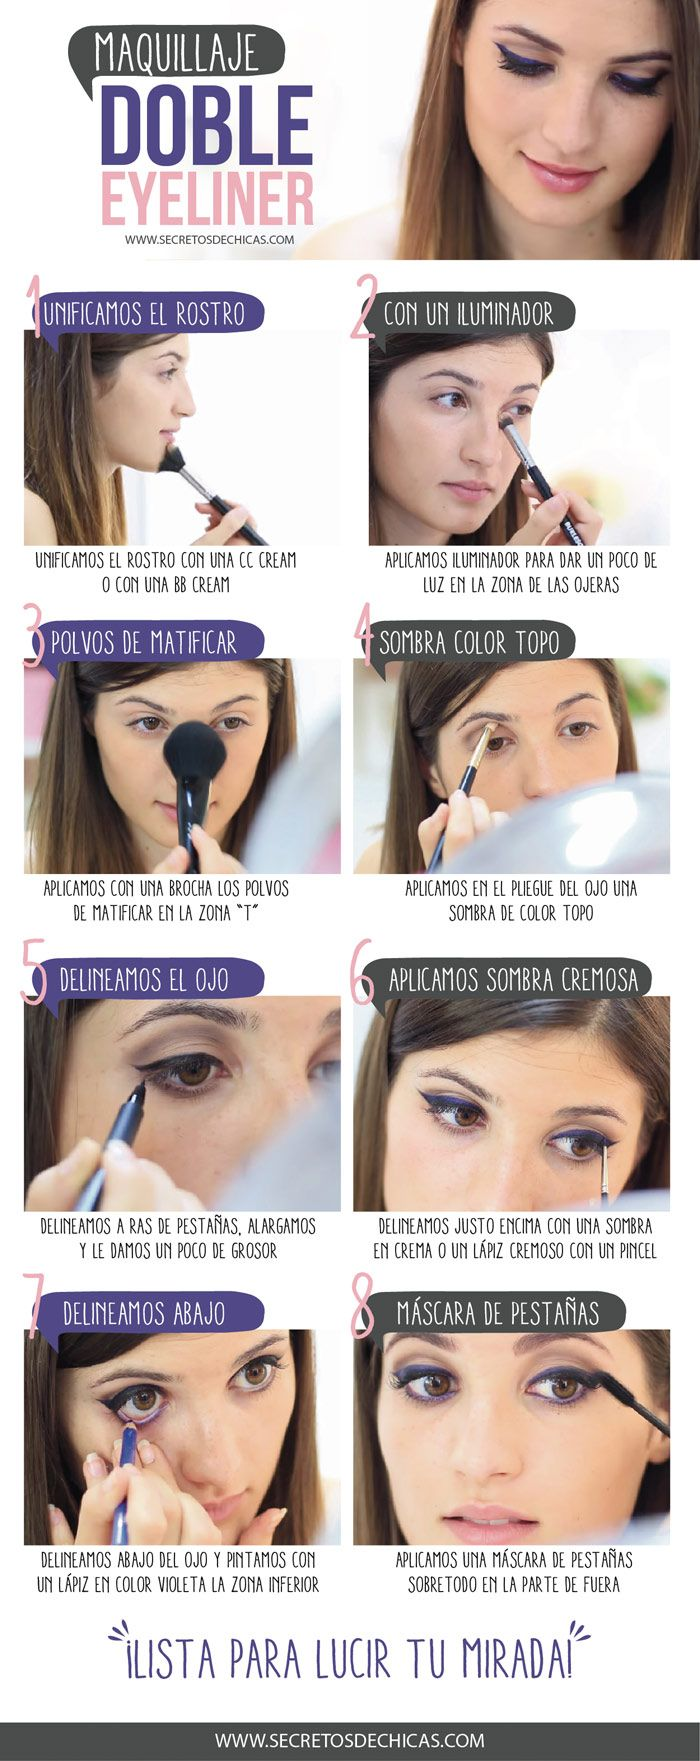 Maquillaje doble eyeliner